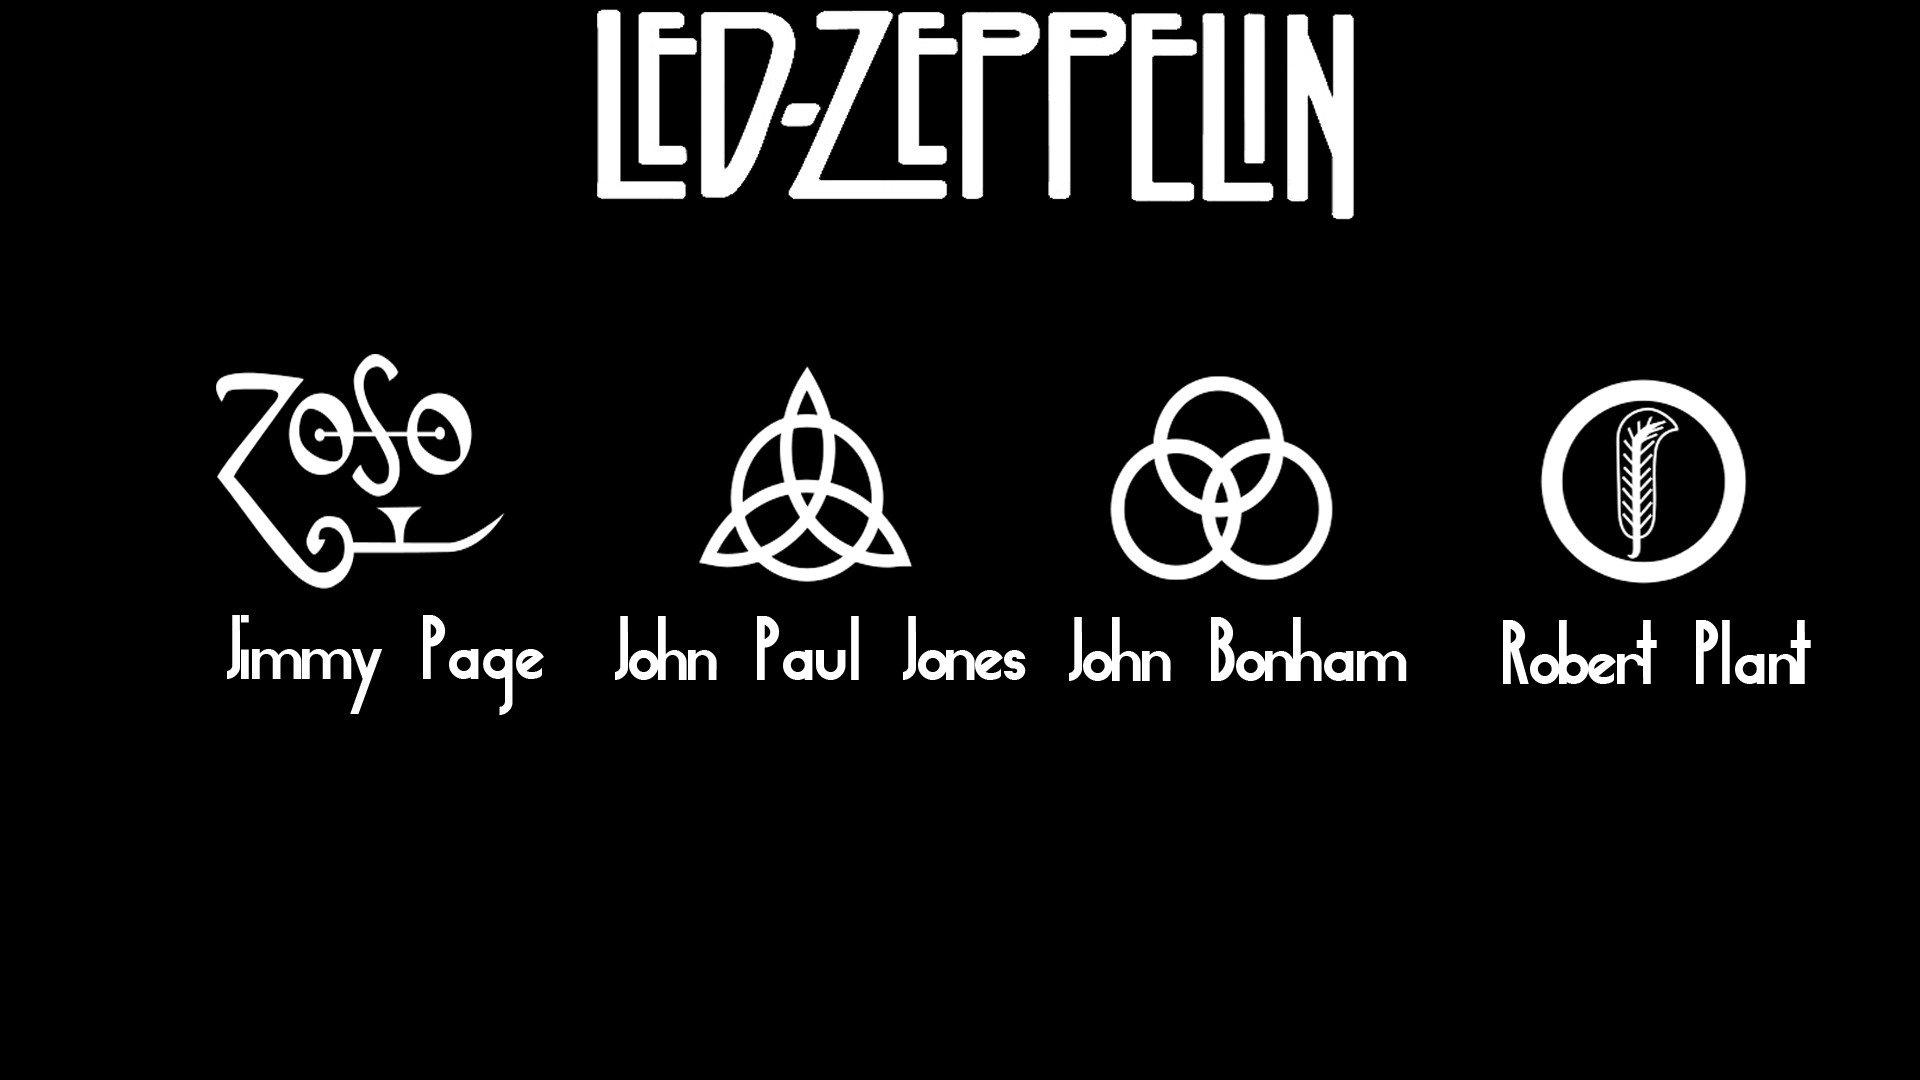 LED ZEPPELIN classic hard rock blues wallpaper 1920x1080 425156 1920x1080